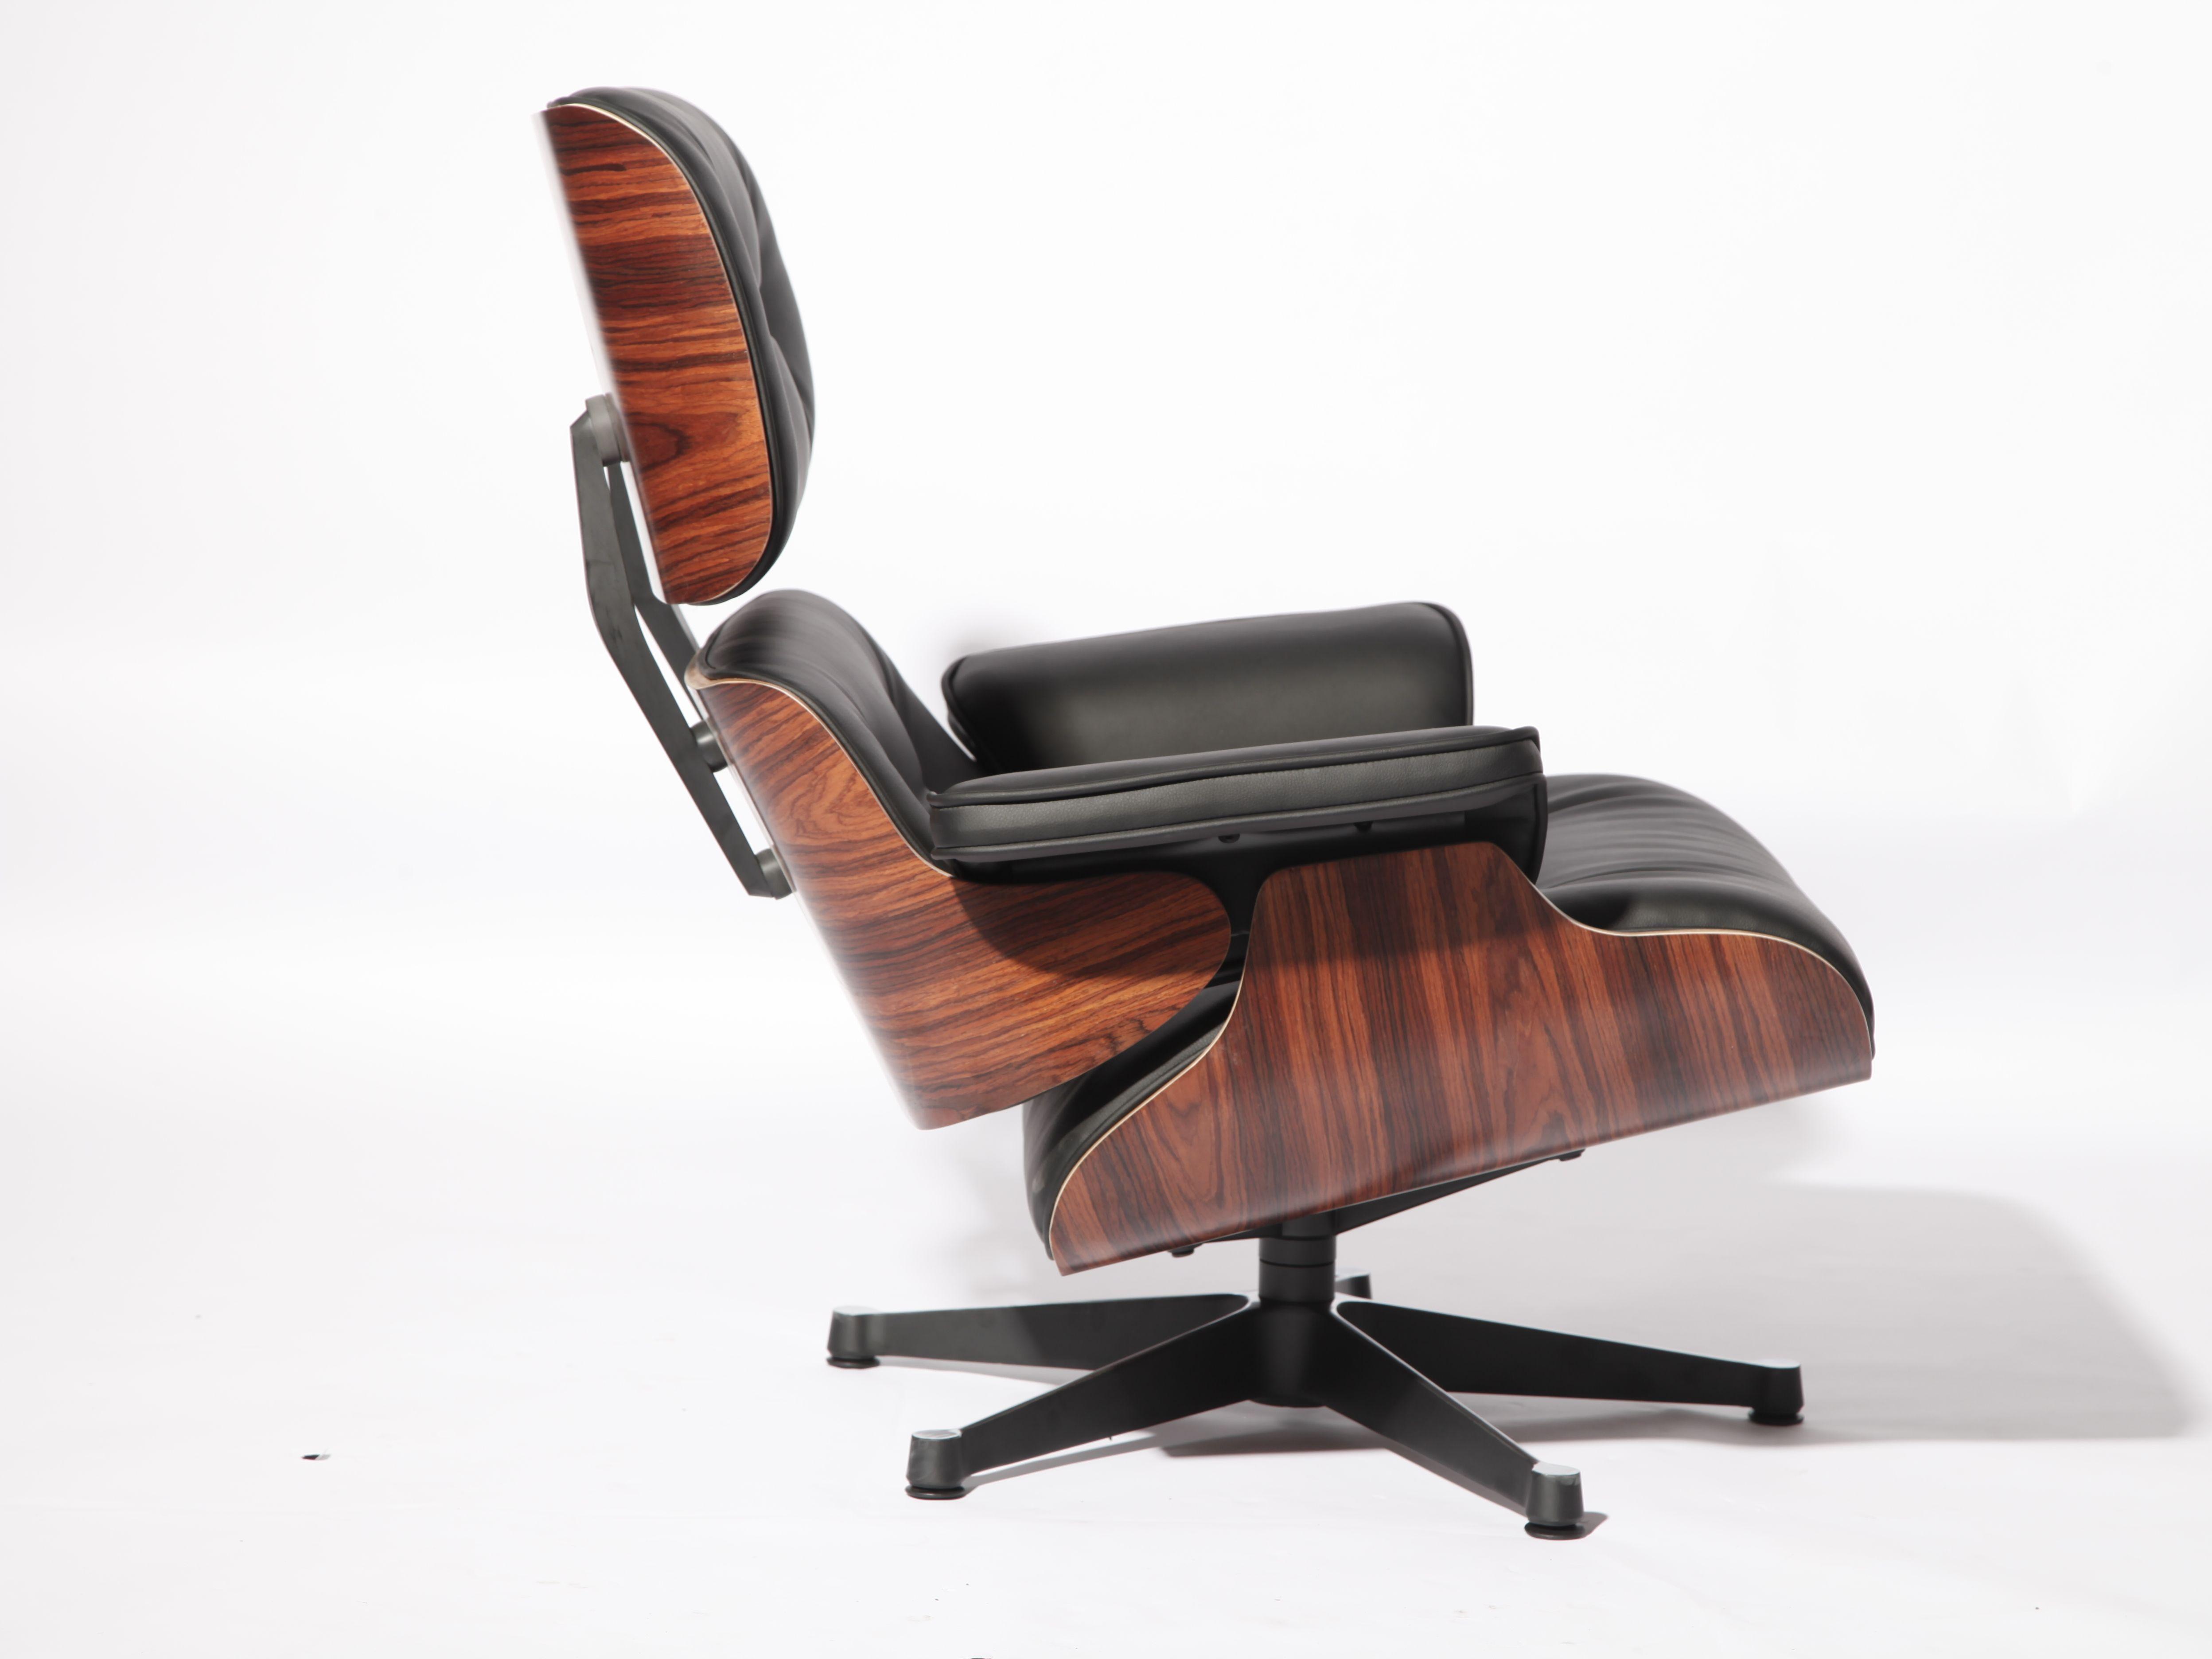 Vitra Lounge Chair Replica classic lounge chair replica - free shipping